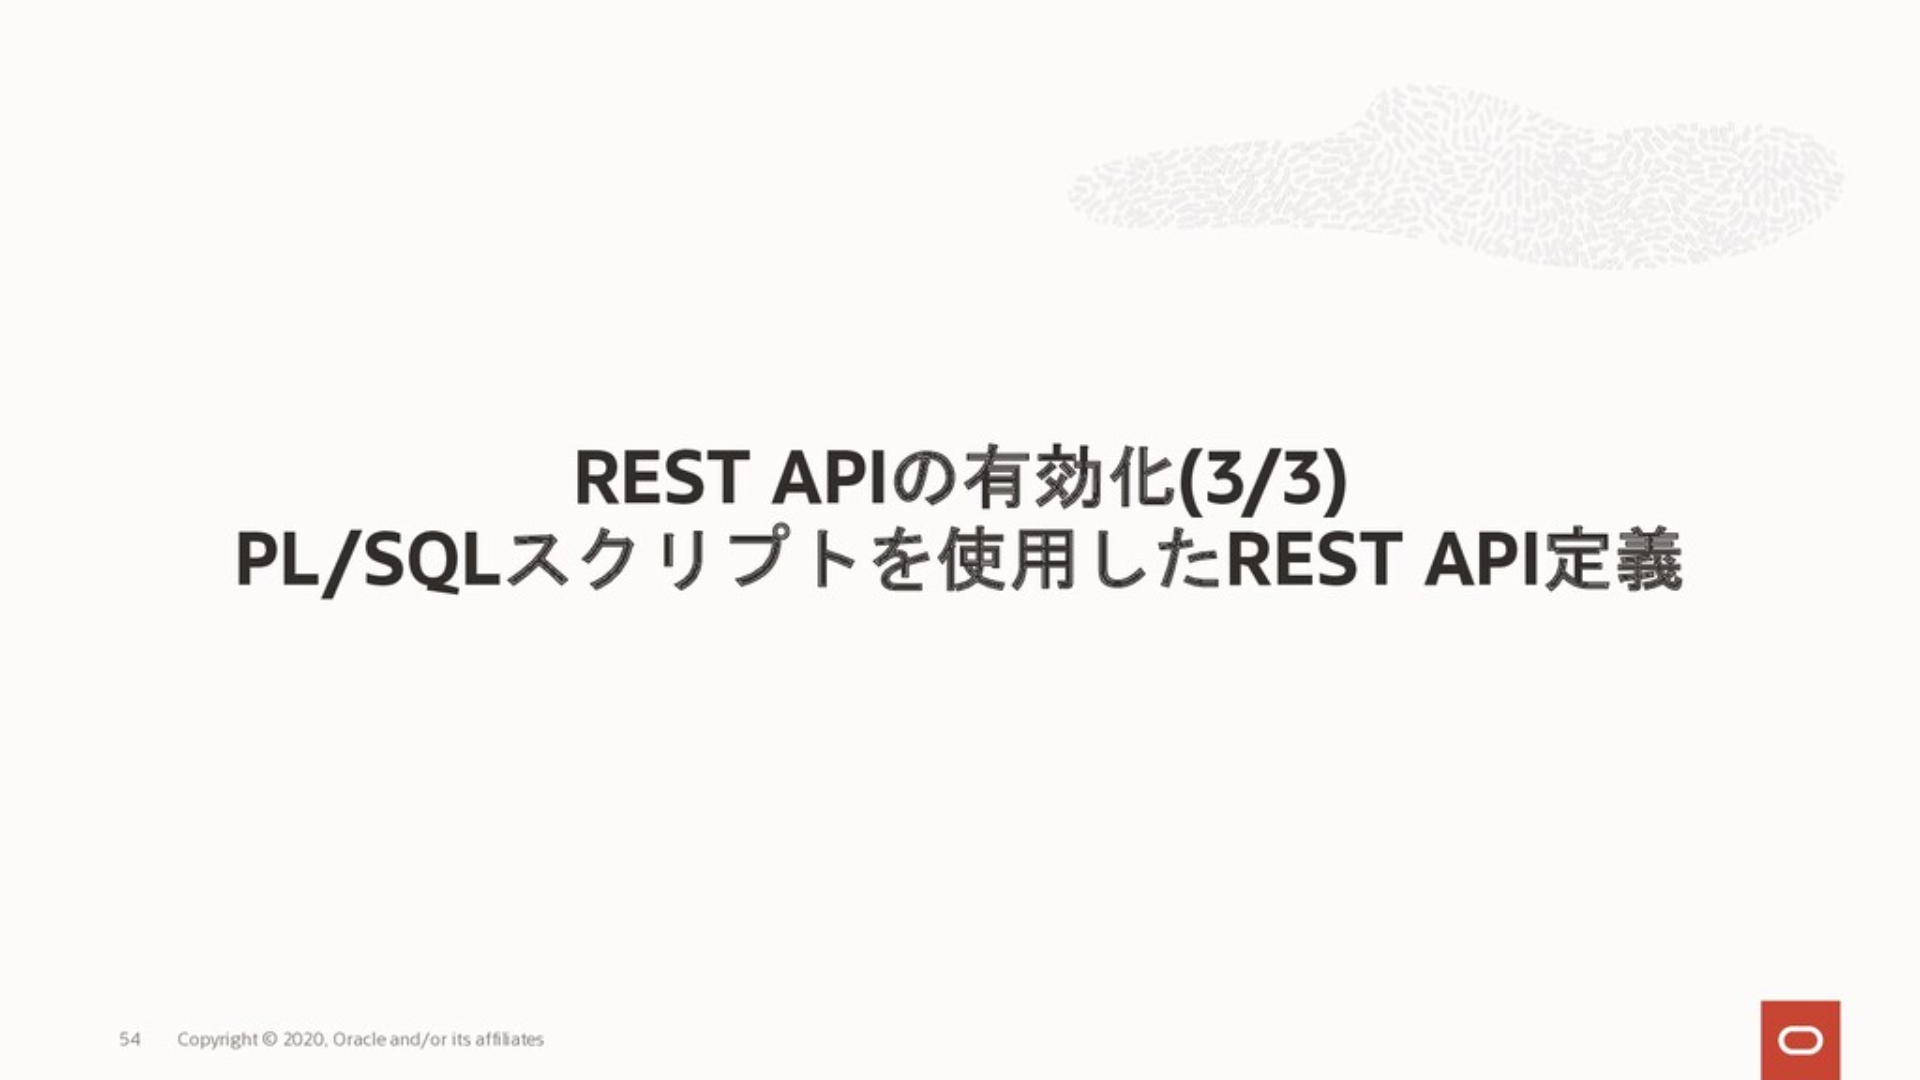 REST APIの有効化(3/3) PL/SQLスクリプトを使用したREST API定義 Co...